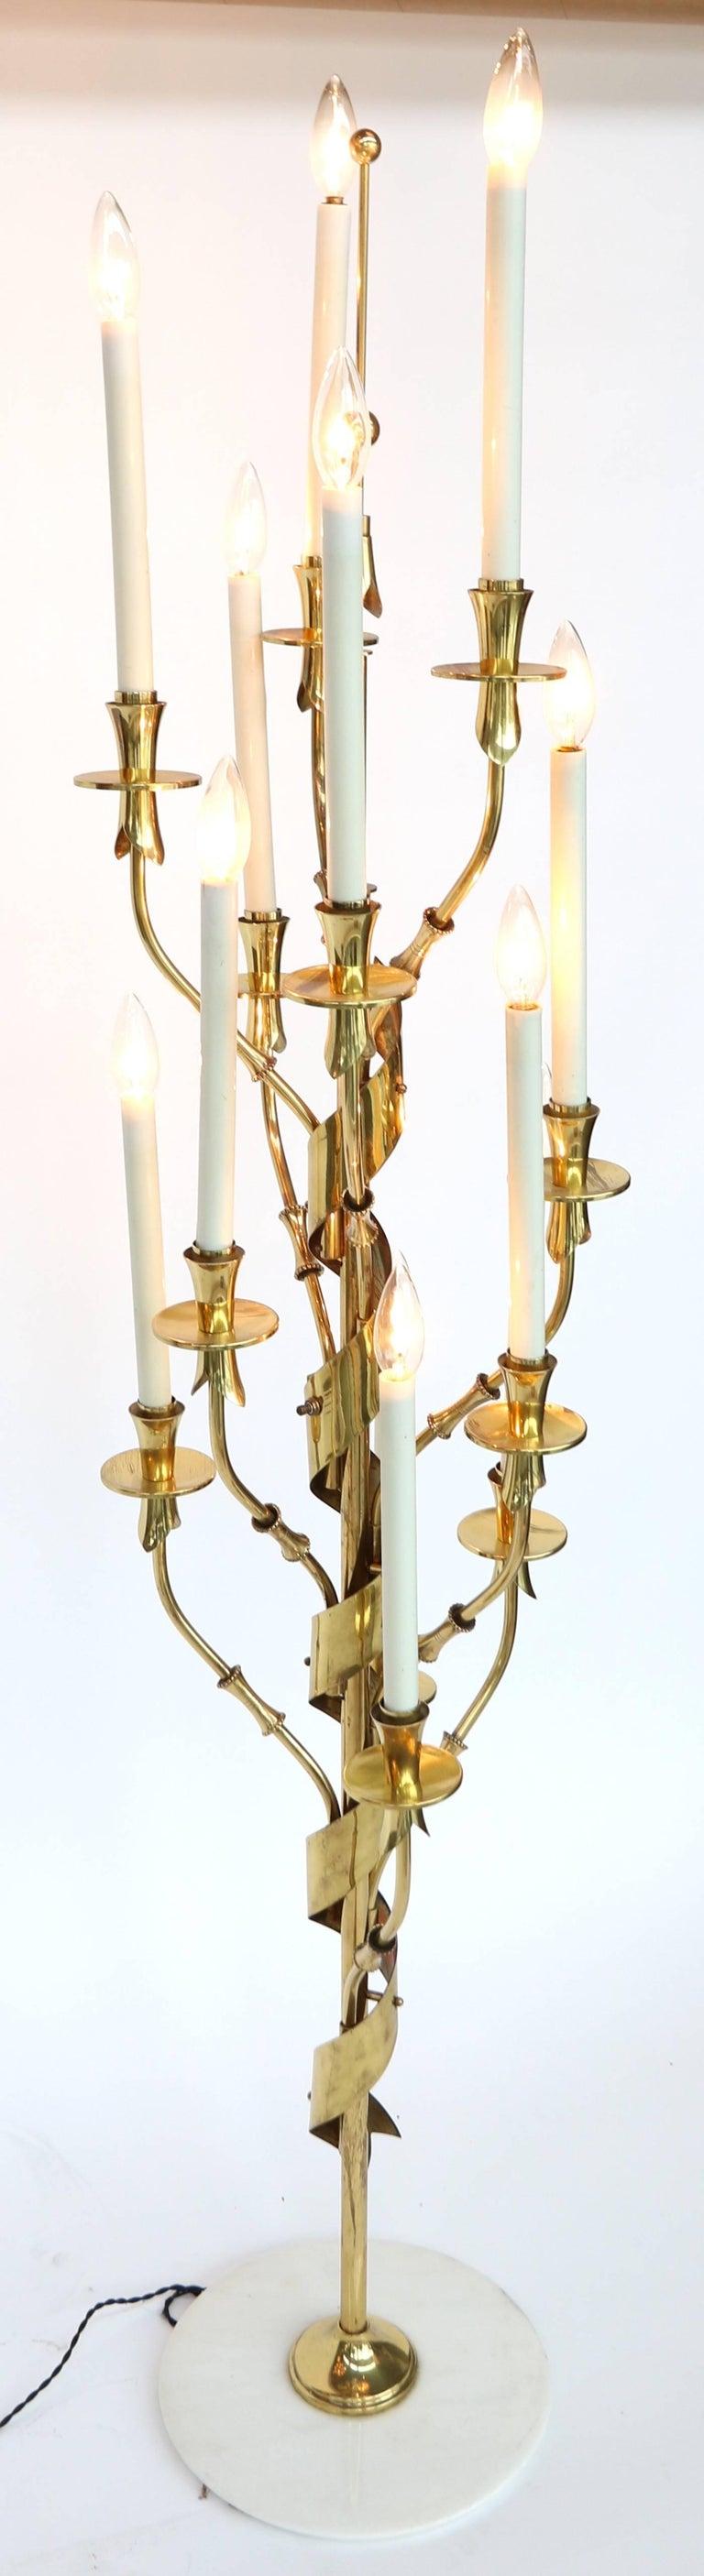 Mid-20th Century 1950s Stilnovo Brass Candelabra Floor Lamp with Marble Base For Sale